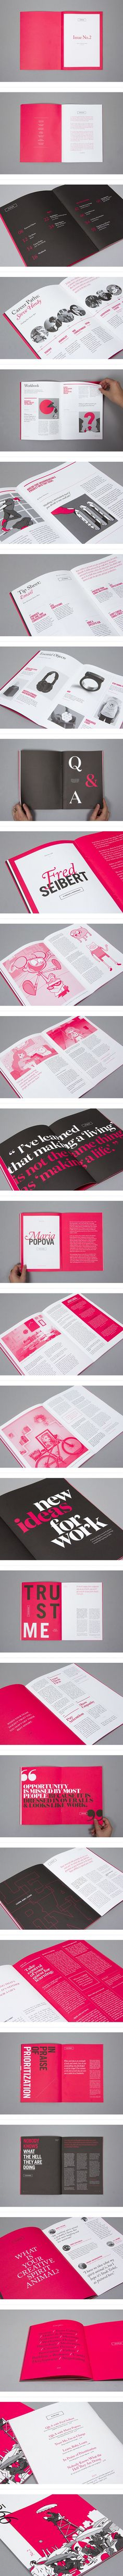 99U Quarterly Magazine :: Issue No.2